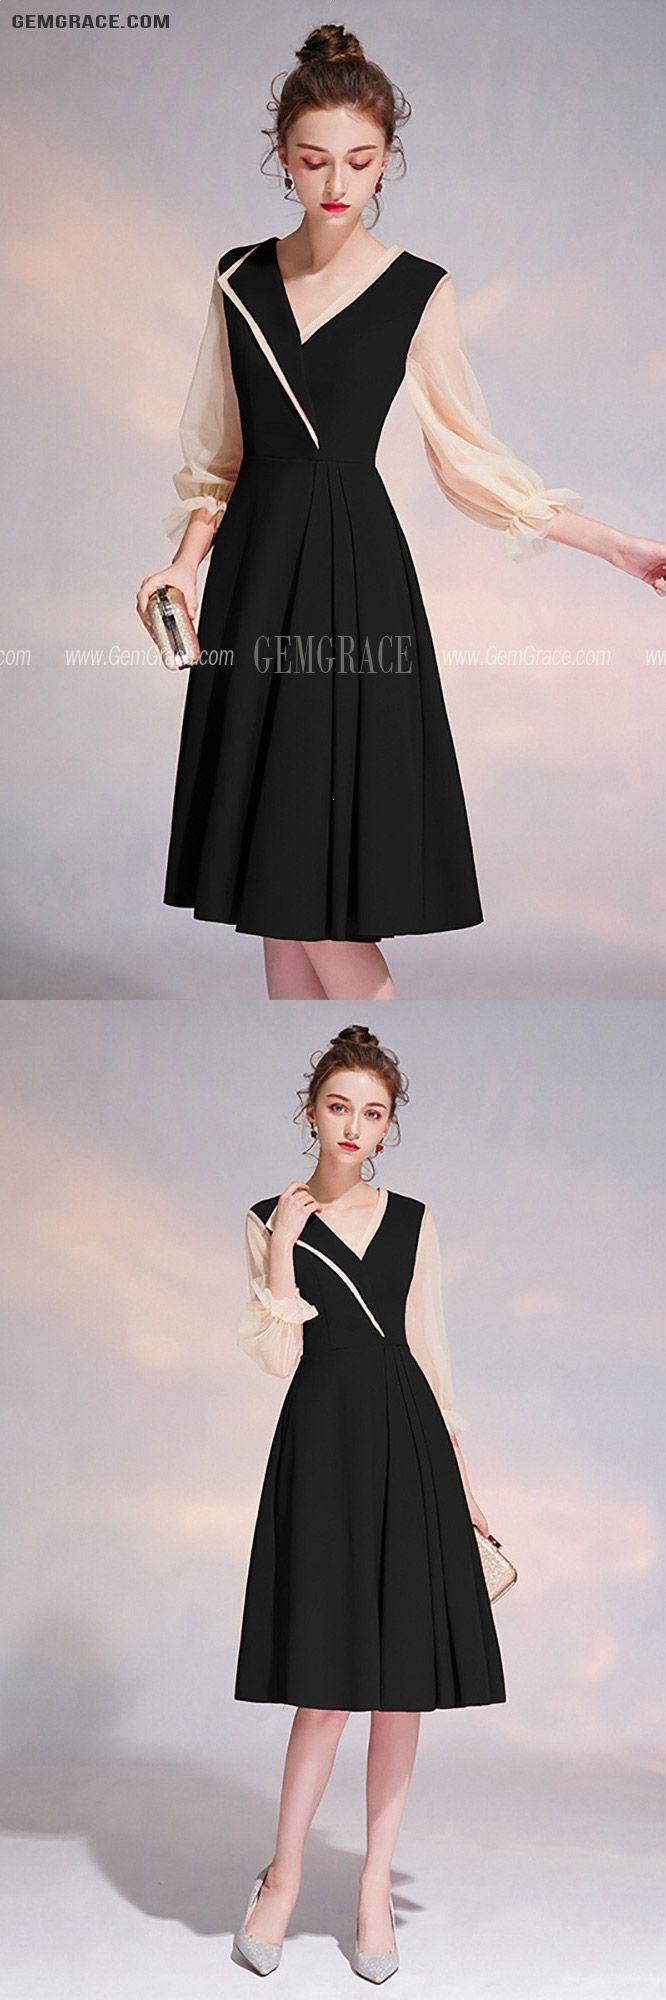 67 19 Elegant Black Vneck Knee Length Party Dress With Sheer Sleeves Htx97062 Gemgrace Com Homecoming Dresses Backless Homecoming Dresses Homecoming Dresses Short Black [ 2000 x 666 Pixel ]